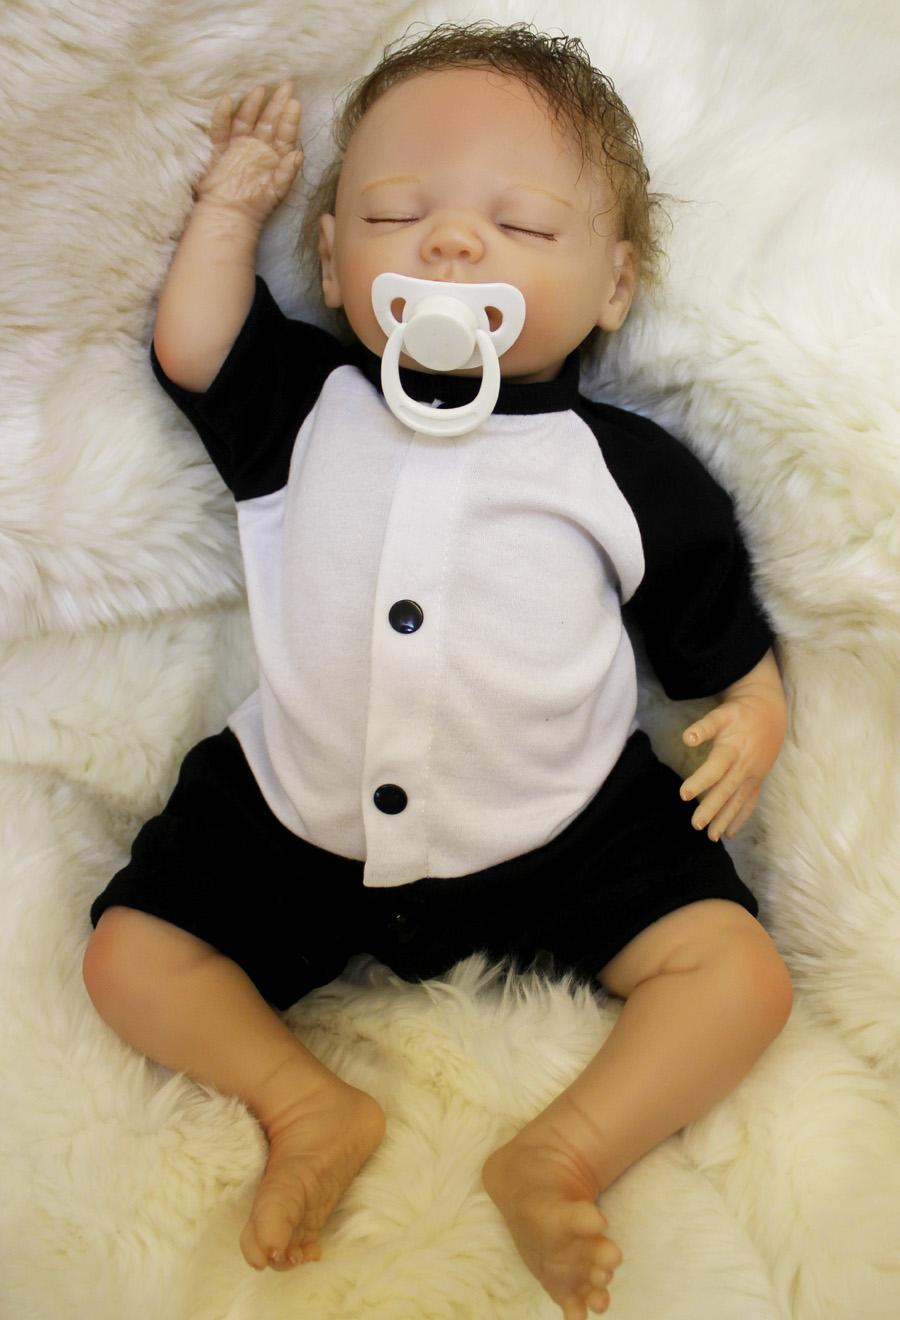 18 Quot Handmade Reborn Baby Doll Newborn Lifelike Dolls Soft